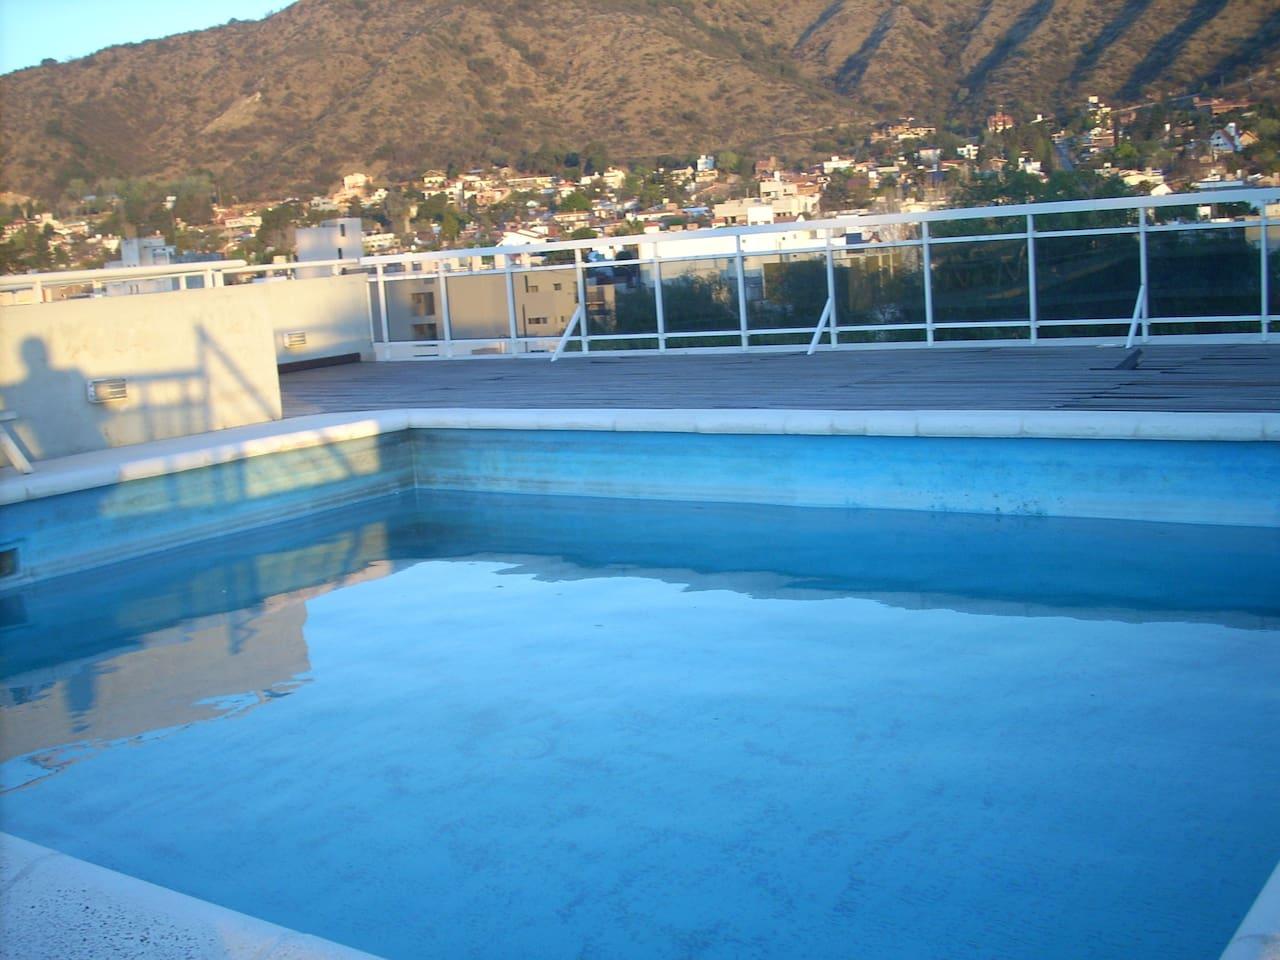 Centric Apartment in Carlos Paz